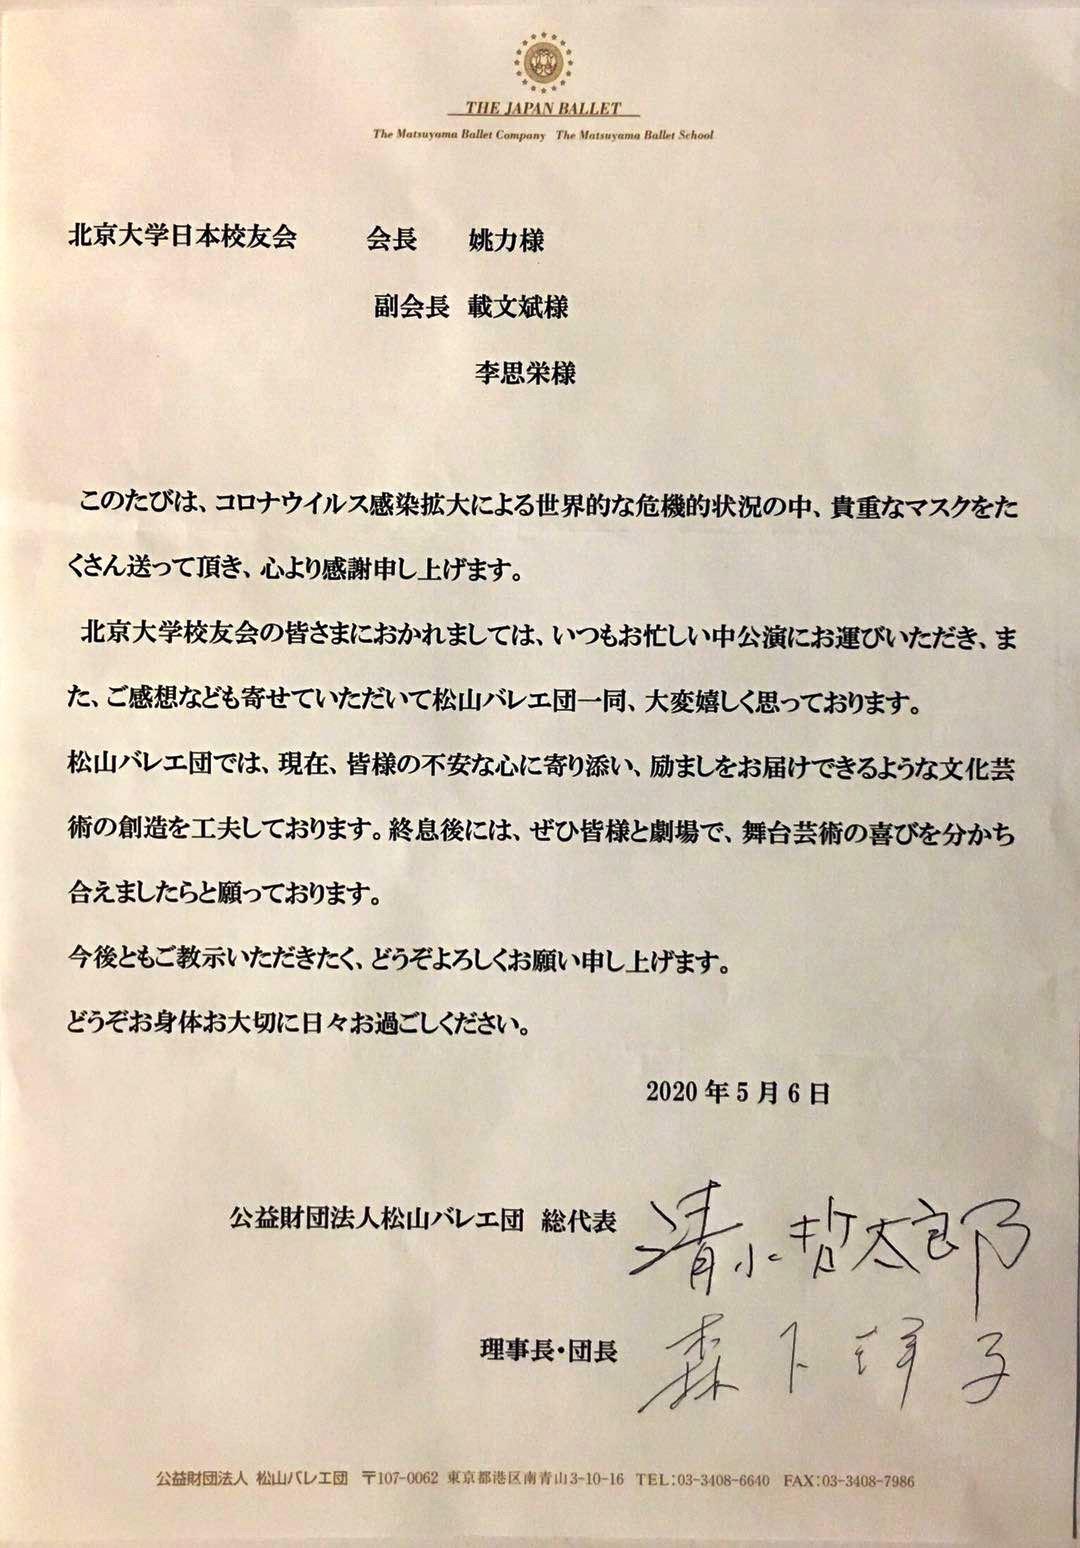 D:\★姚力\★★第十届理事会\★李思荣捐赠口罩5千只\松山芭蕾舞团感谢信_20200513.jpg